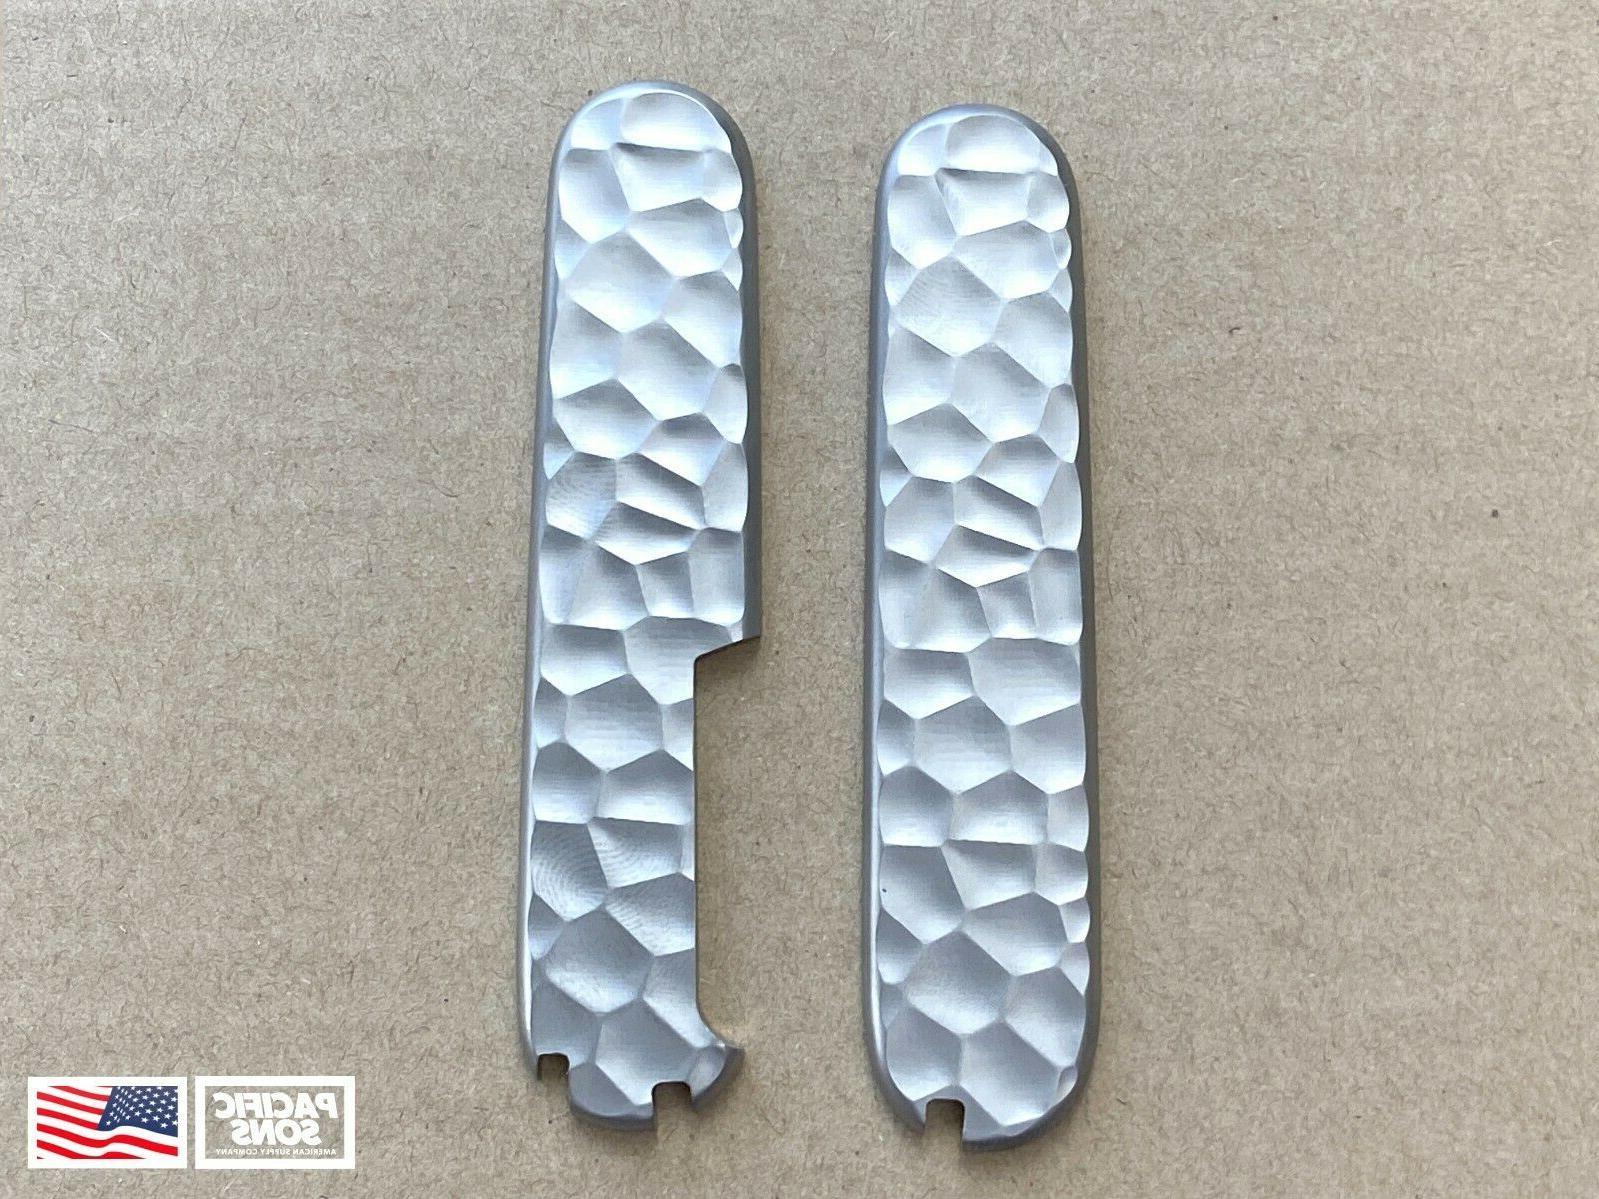 91mm titanium swiss army knife scales rock